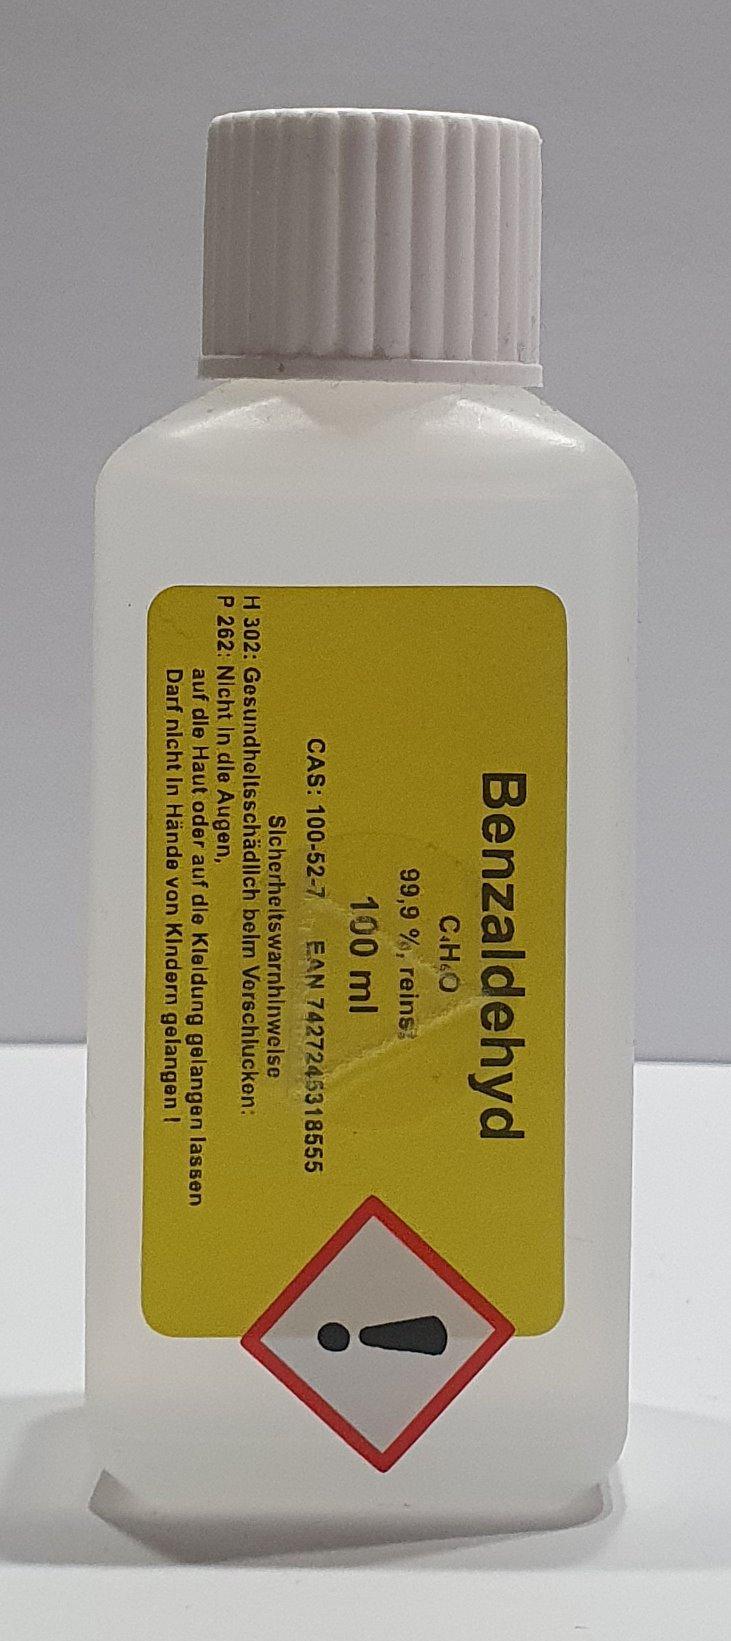 100 ml Benzaldehyd Benzaldehyde 99,9% Bitter Mandel Aroma